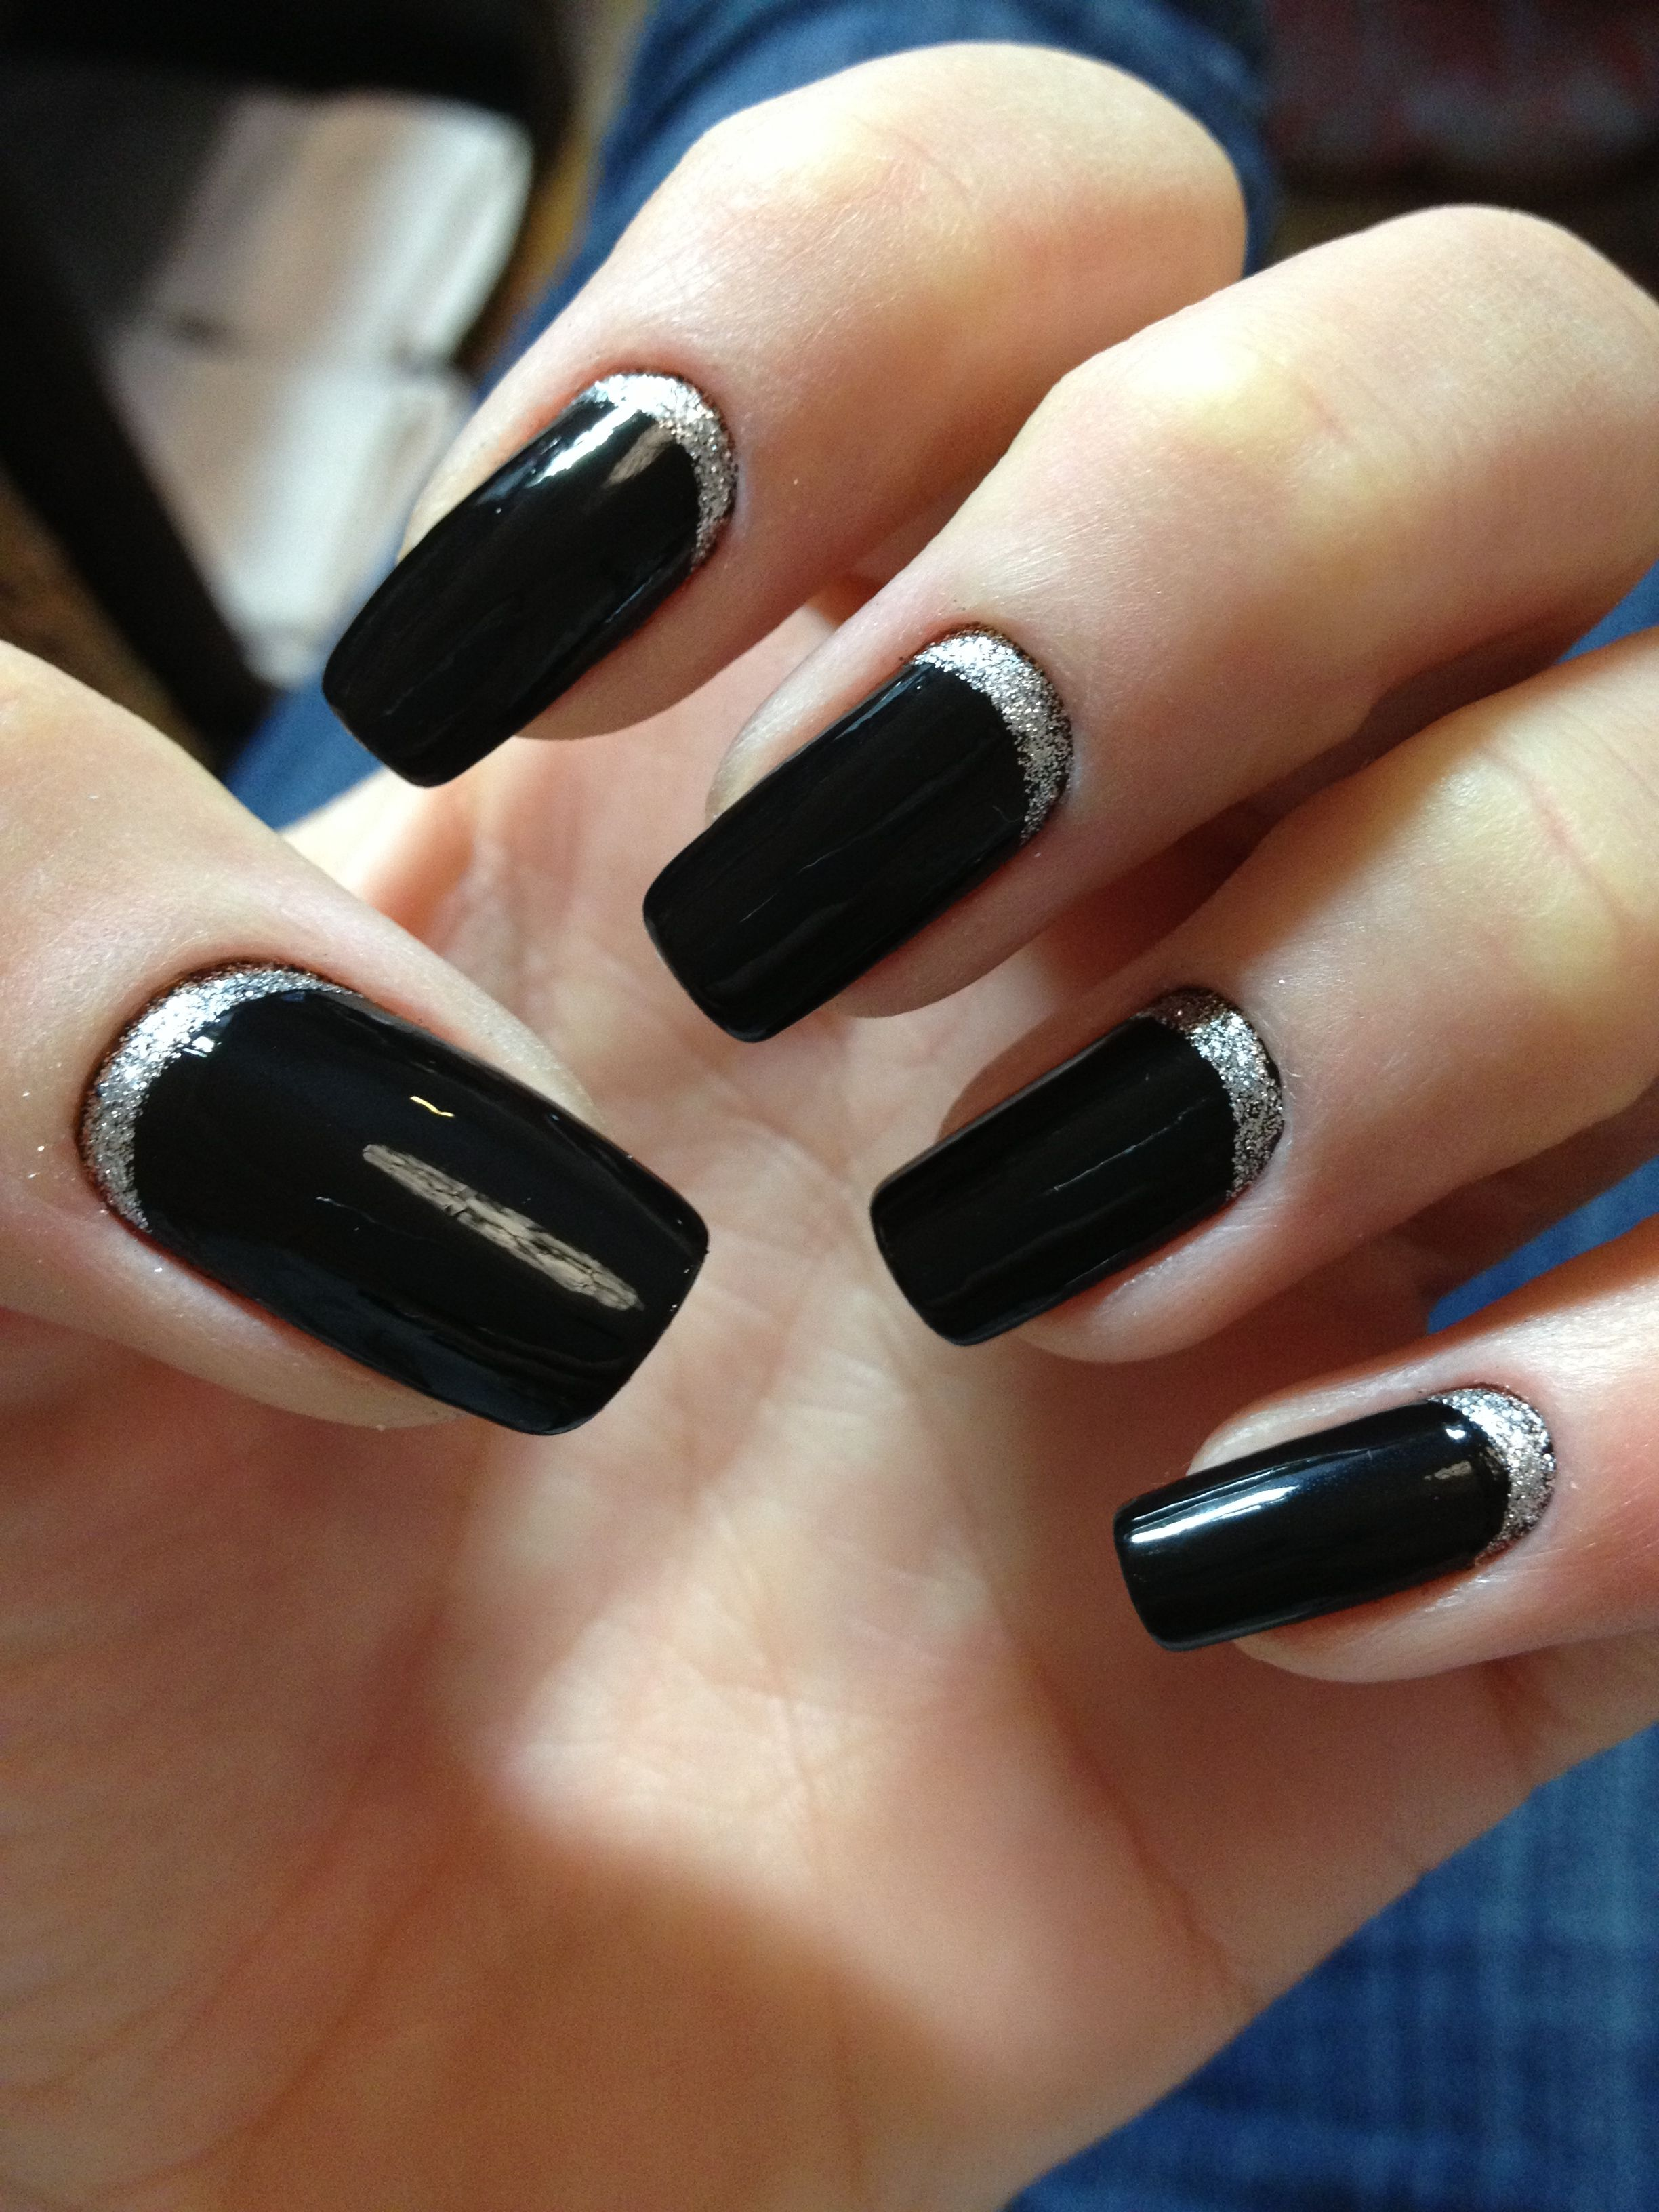 Glitter moon nails!